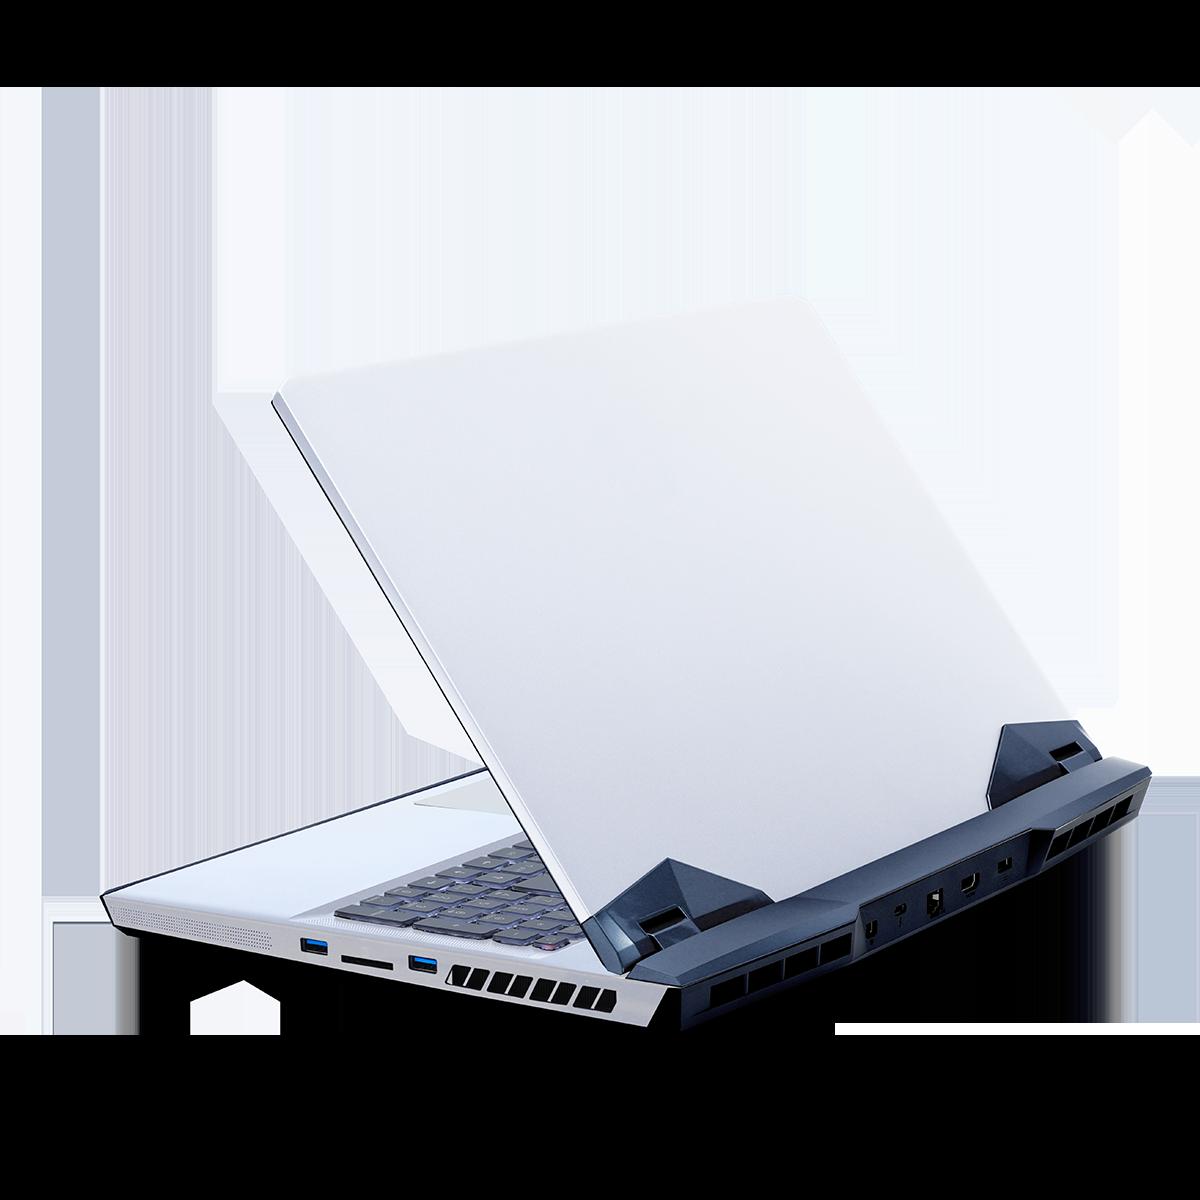 VELUGA A5000 G3-17(OS無し) 17.3インチ / Core i9 11980HK / RTX A5000 / メモリ 64GB / SSD 2TB /OSなし / ノートパソコン ELSA エルザ モバイルワークステーション ELVG317-i9A5K6412SNR 【代引・日時指定・キャンセル不可・北海道沖縄離島配送不可】